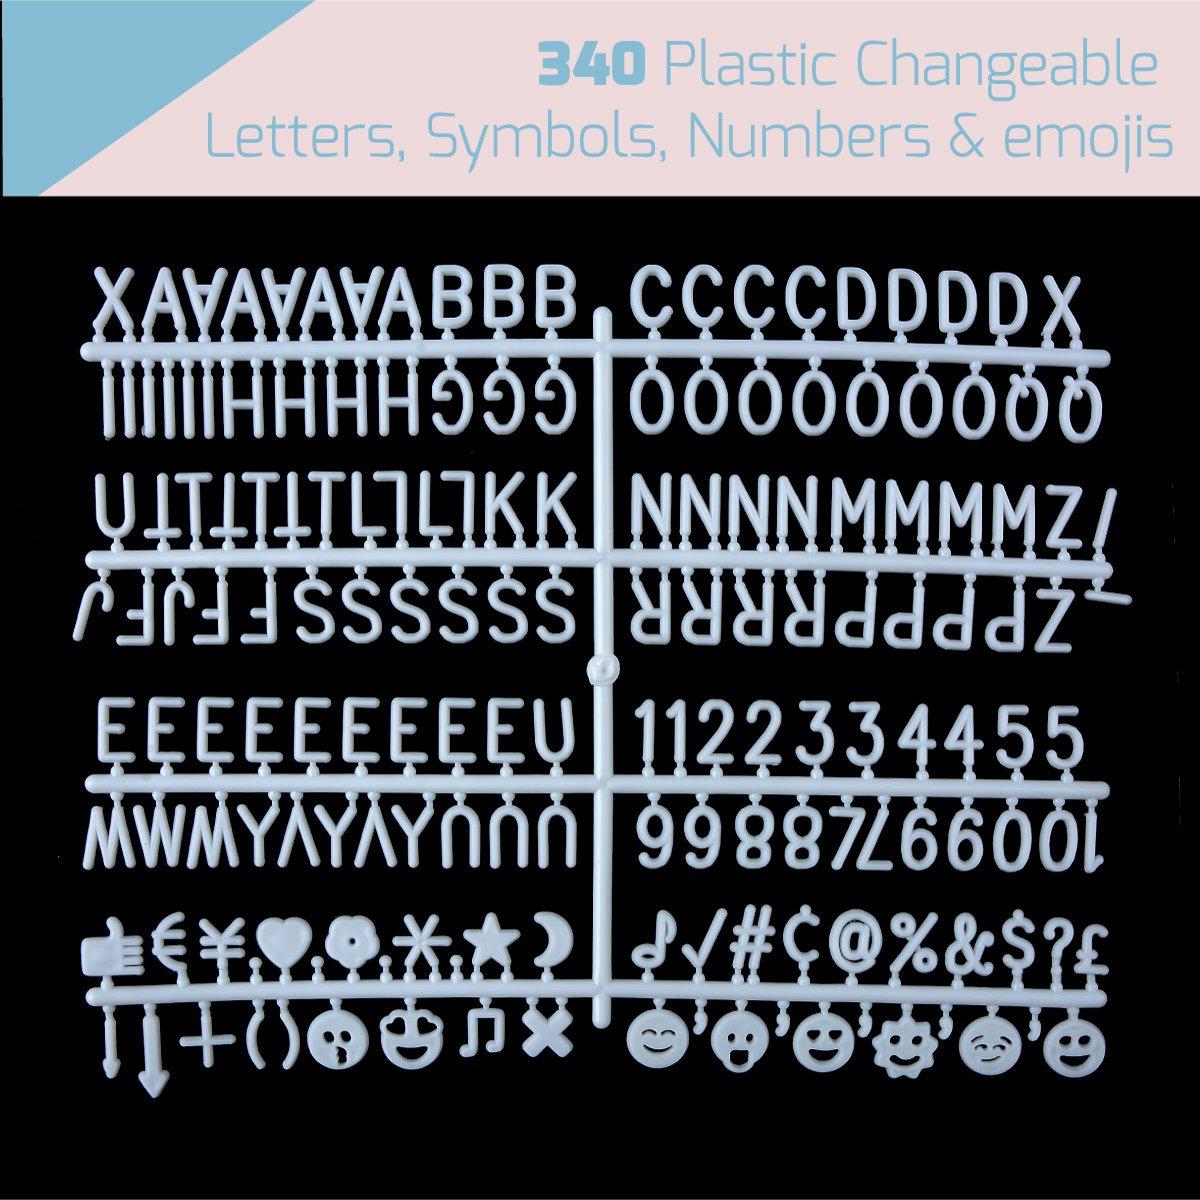 Amazon Felt Letter Board With 340 Plastic Changeable Letters